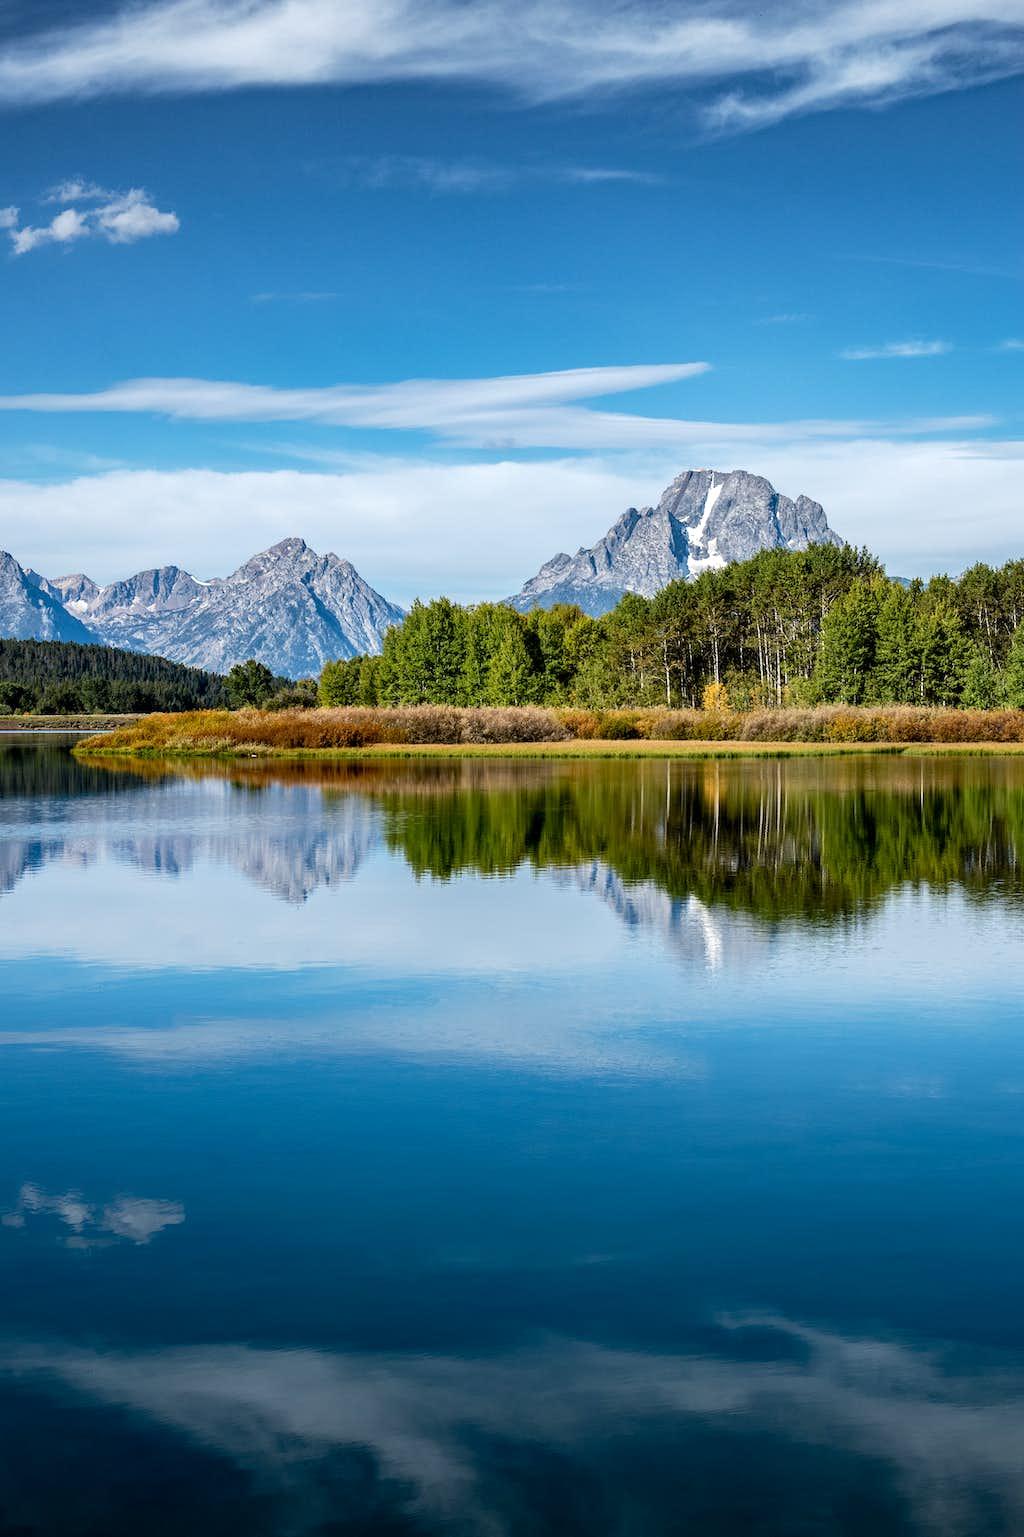 Oxbow Bend, Snake River, Mount Moran, Grand Teton National Park, Wyoming 9:19:19